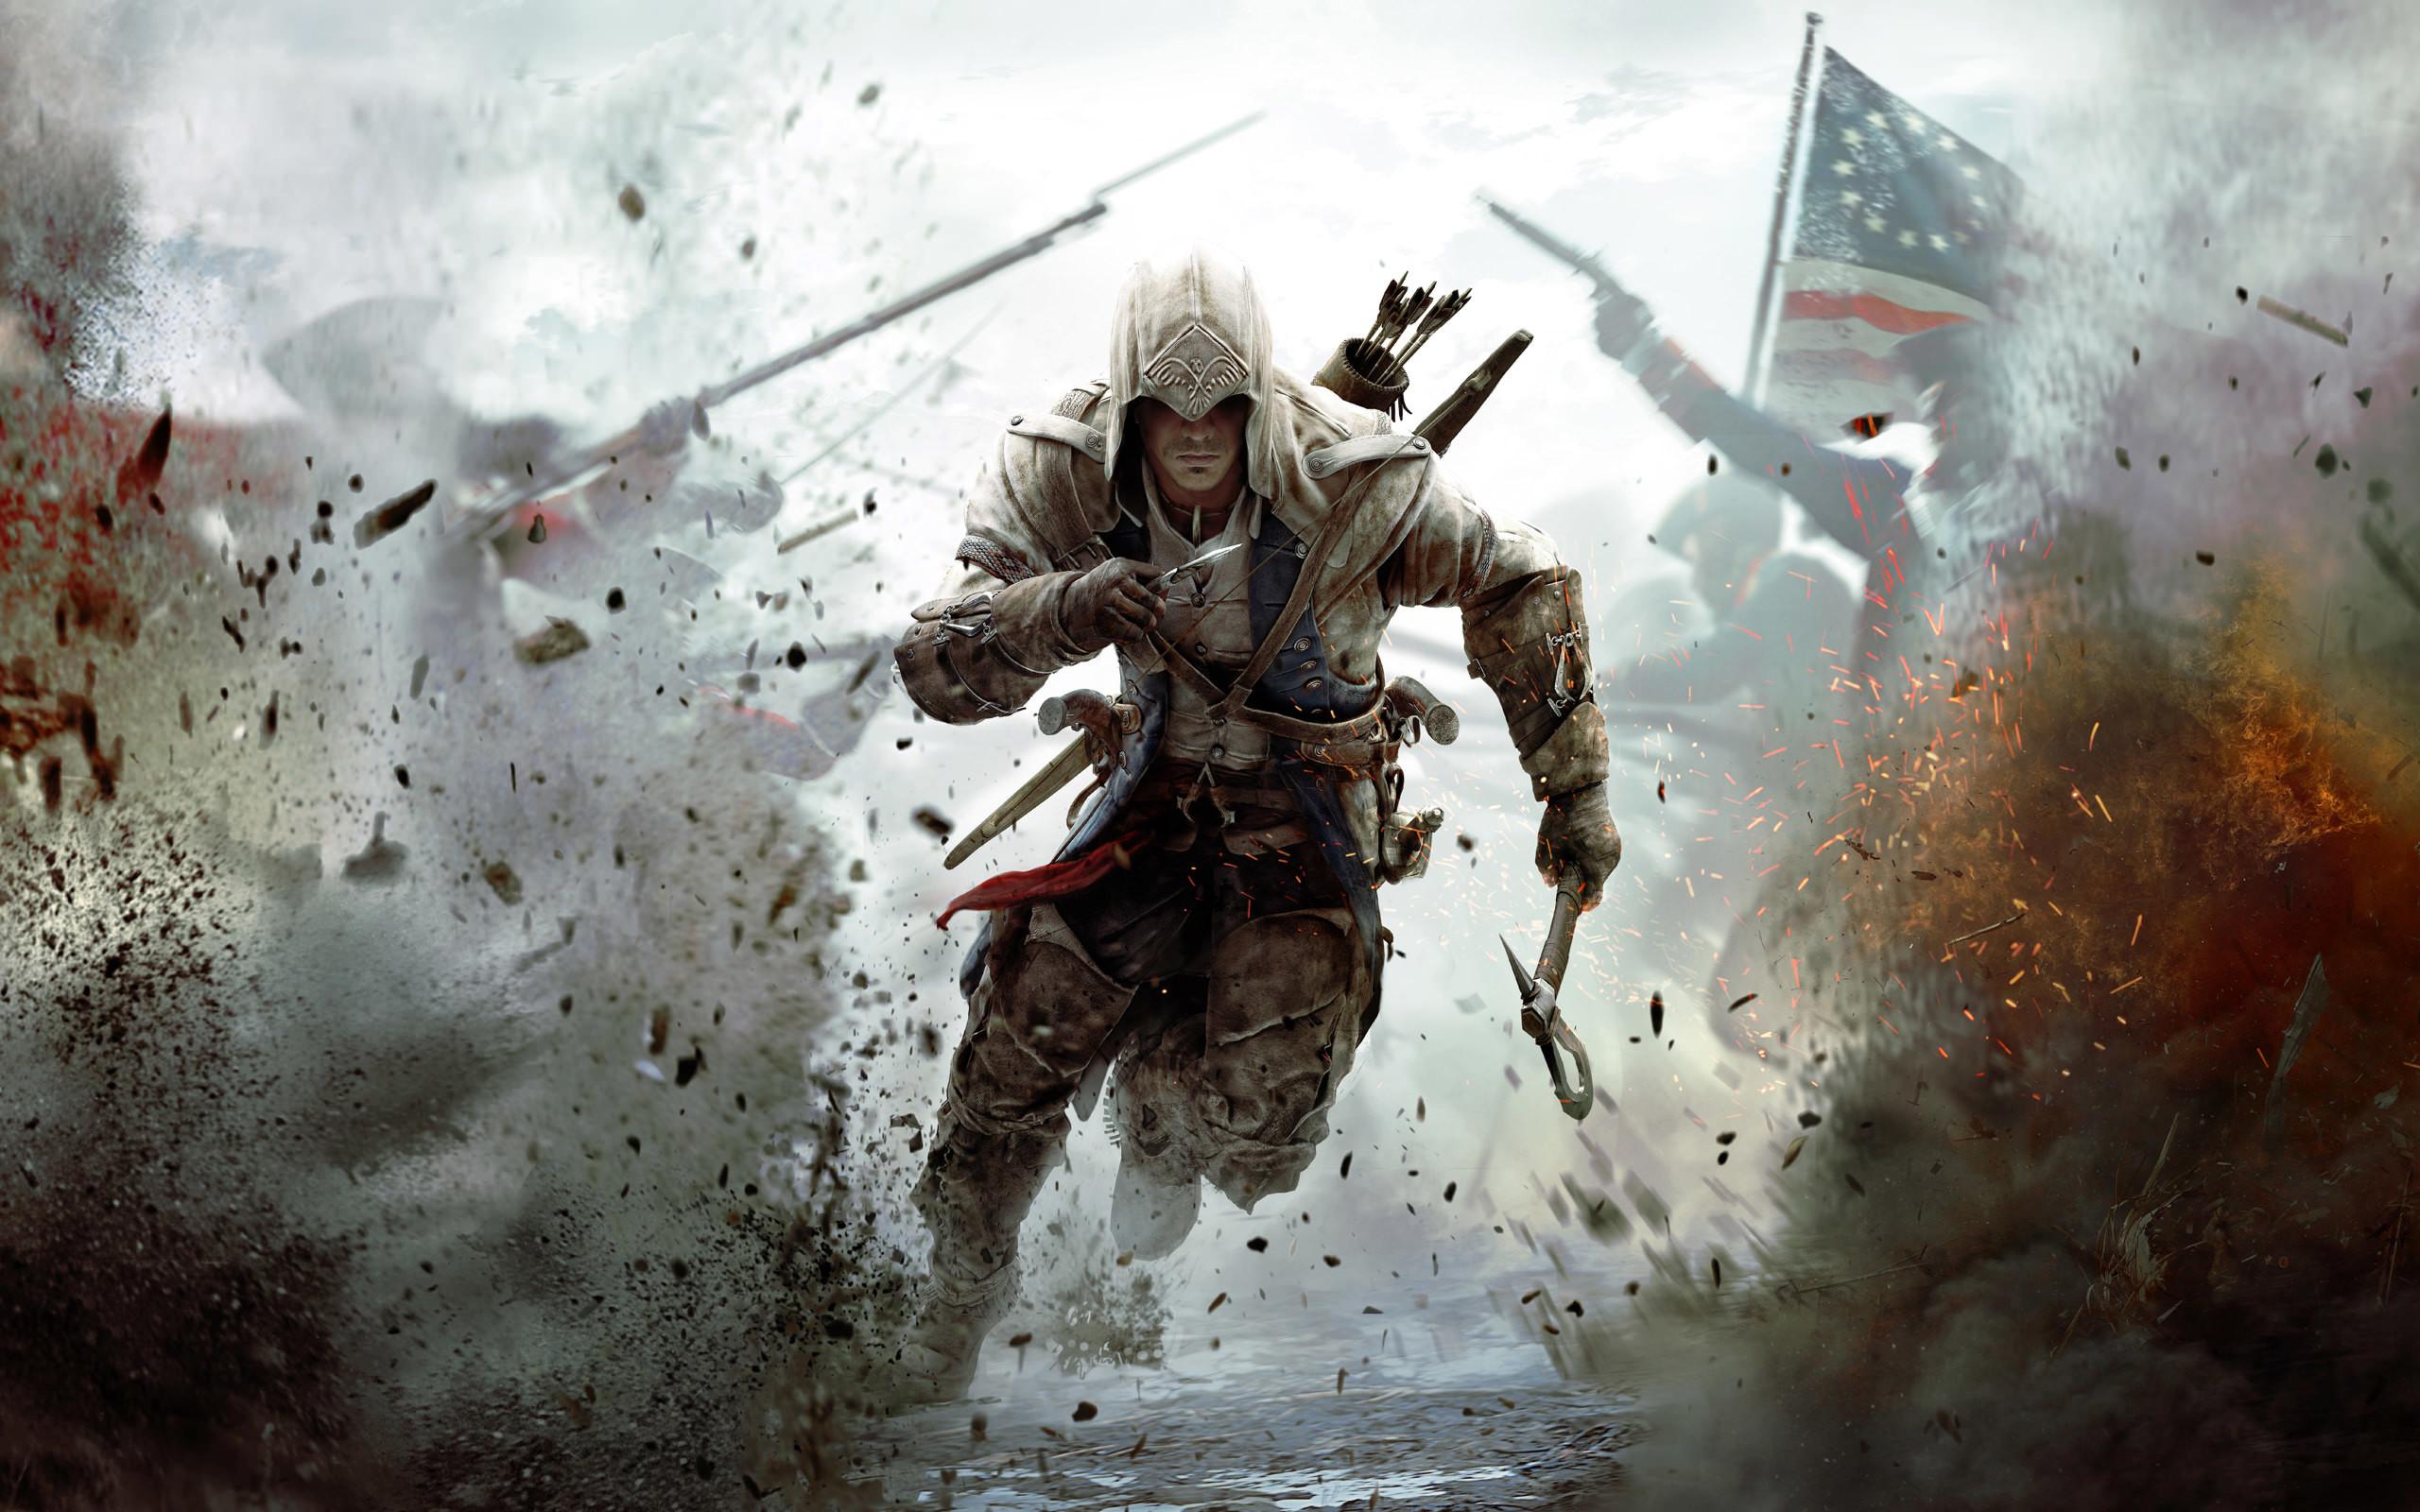 Assassins Creed 3 Game Wallpaper